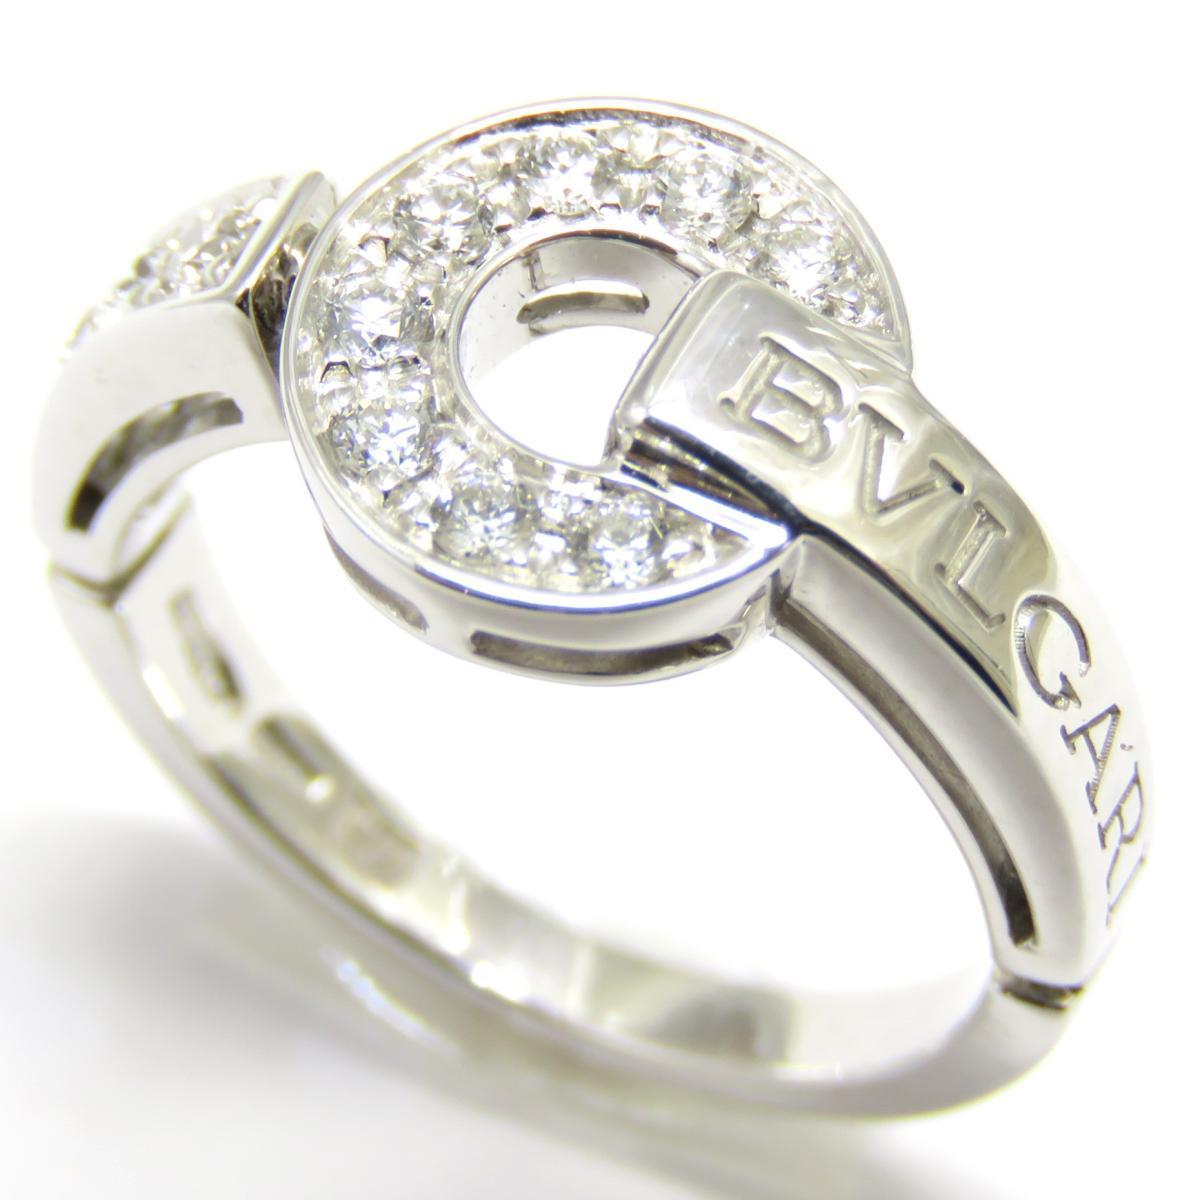 BVLGARI(ブルガリ)/ブルガリブルガリ ダイヤリング リング 指輪/リング//K18WG(750)ホワイトゴールド/【ランクA】/8.5号【中古】